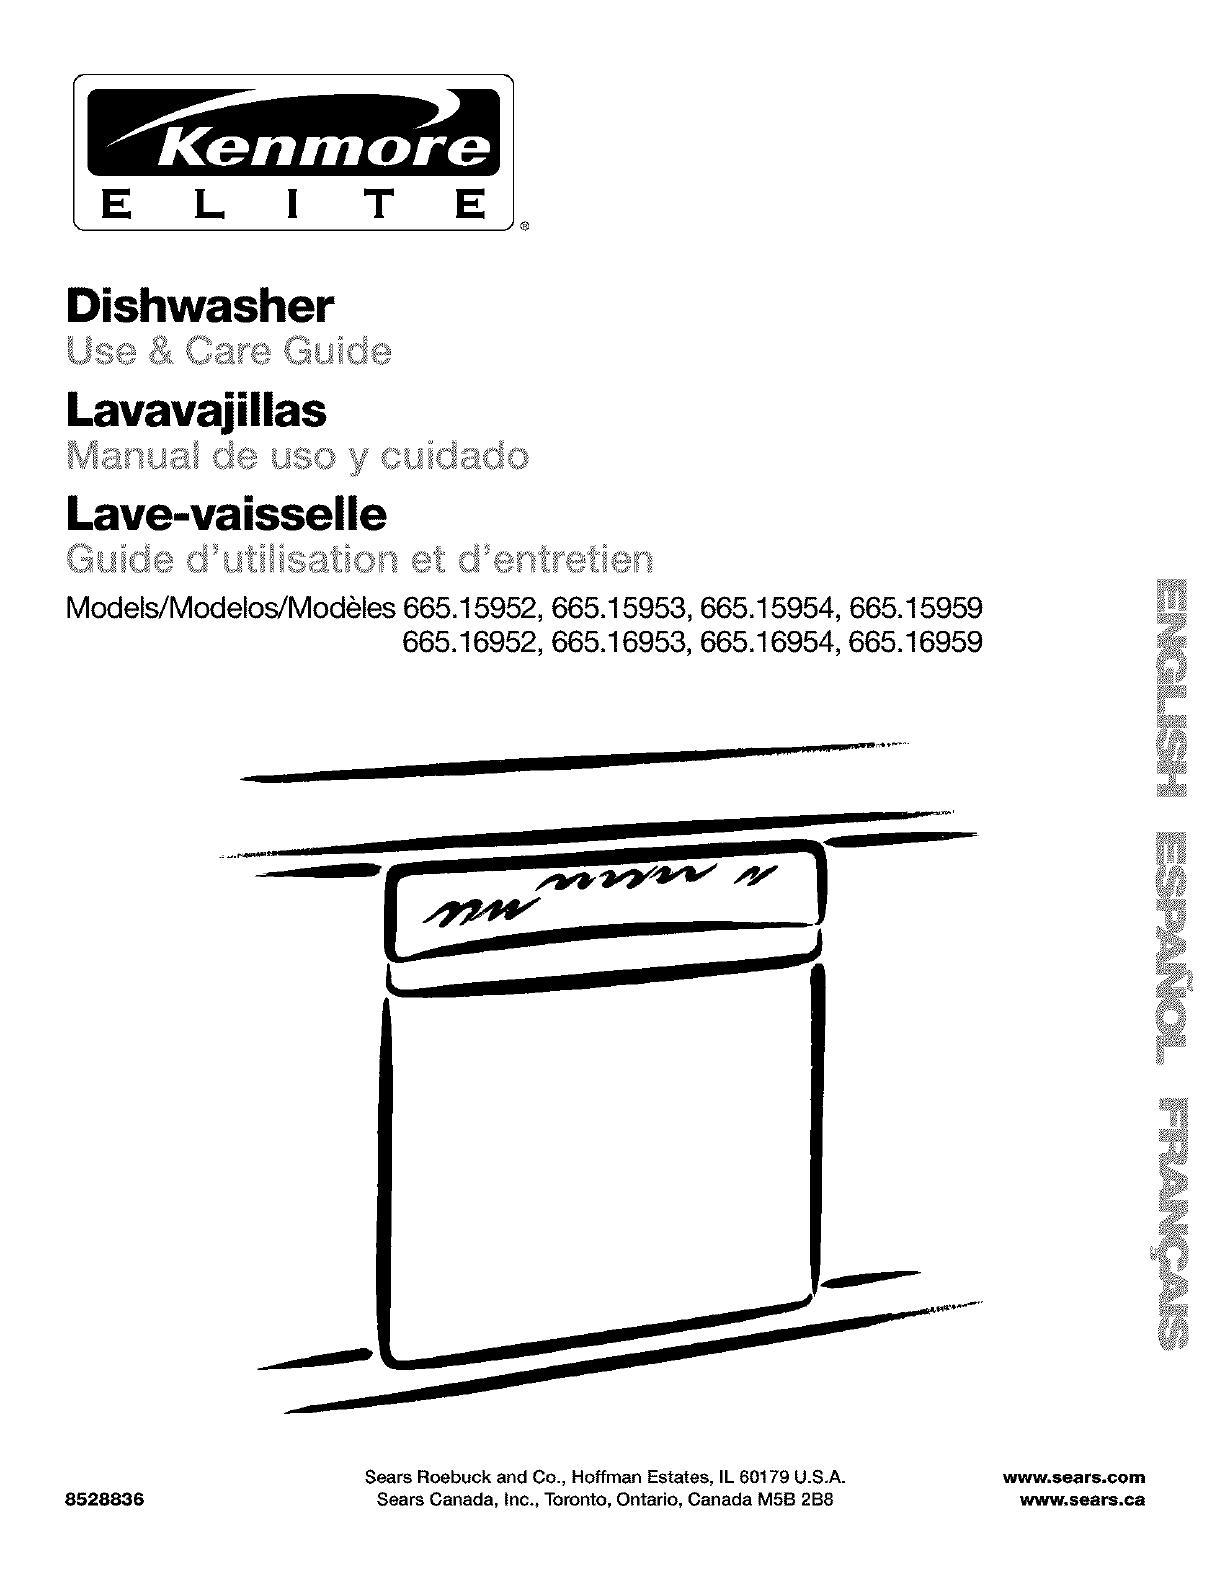 Kenmore Elite 66515953000 User Manual DISHWASHER Manuals And Guides L0212116